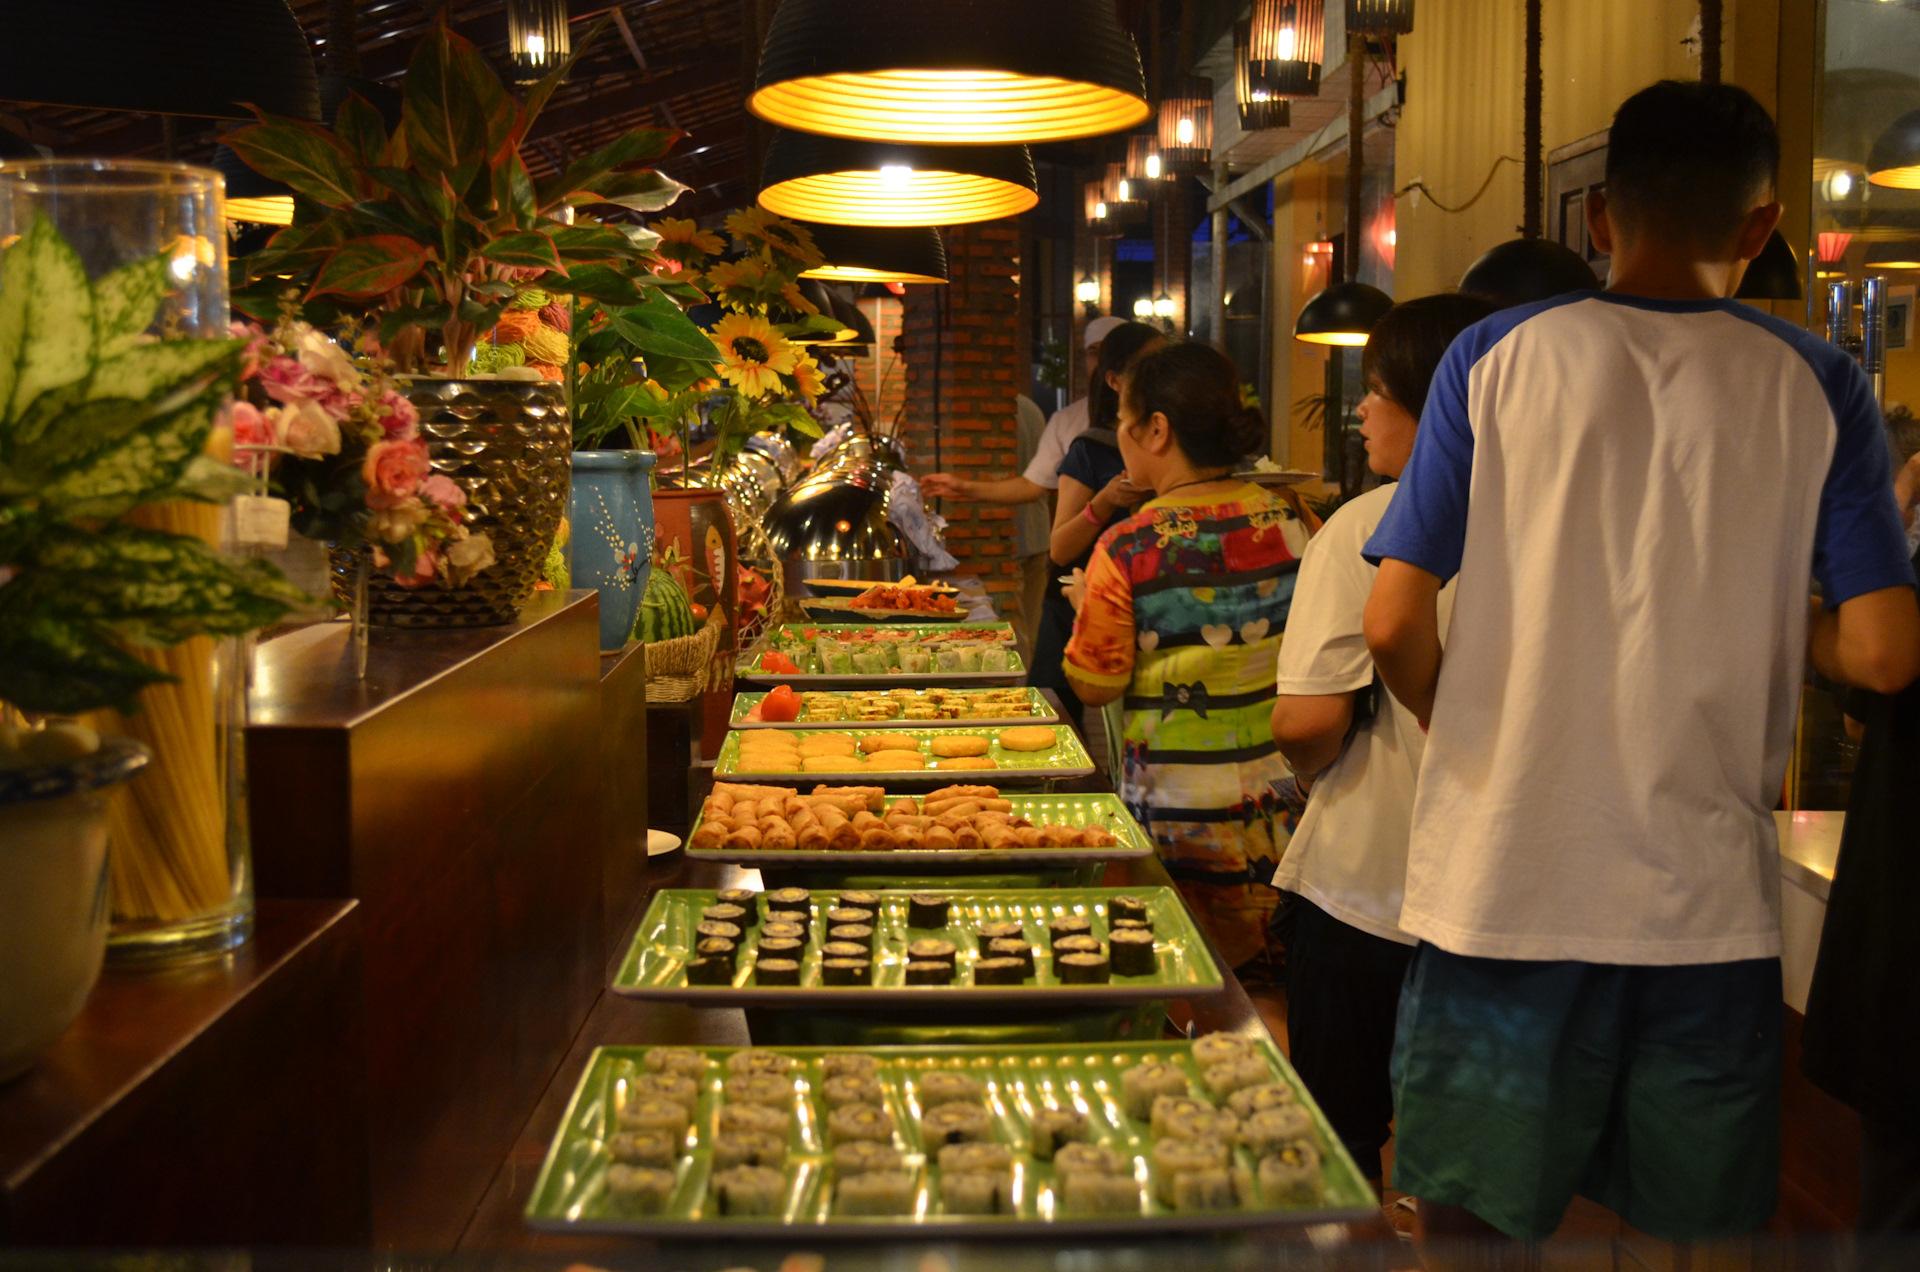 Фото ресторана в Нячанге